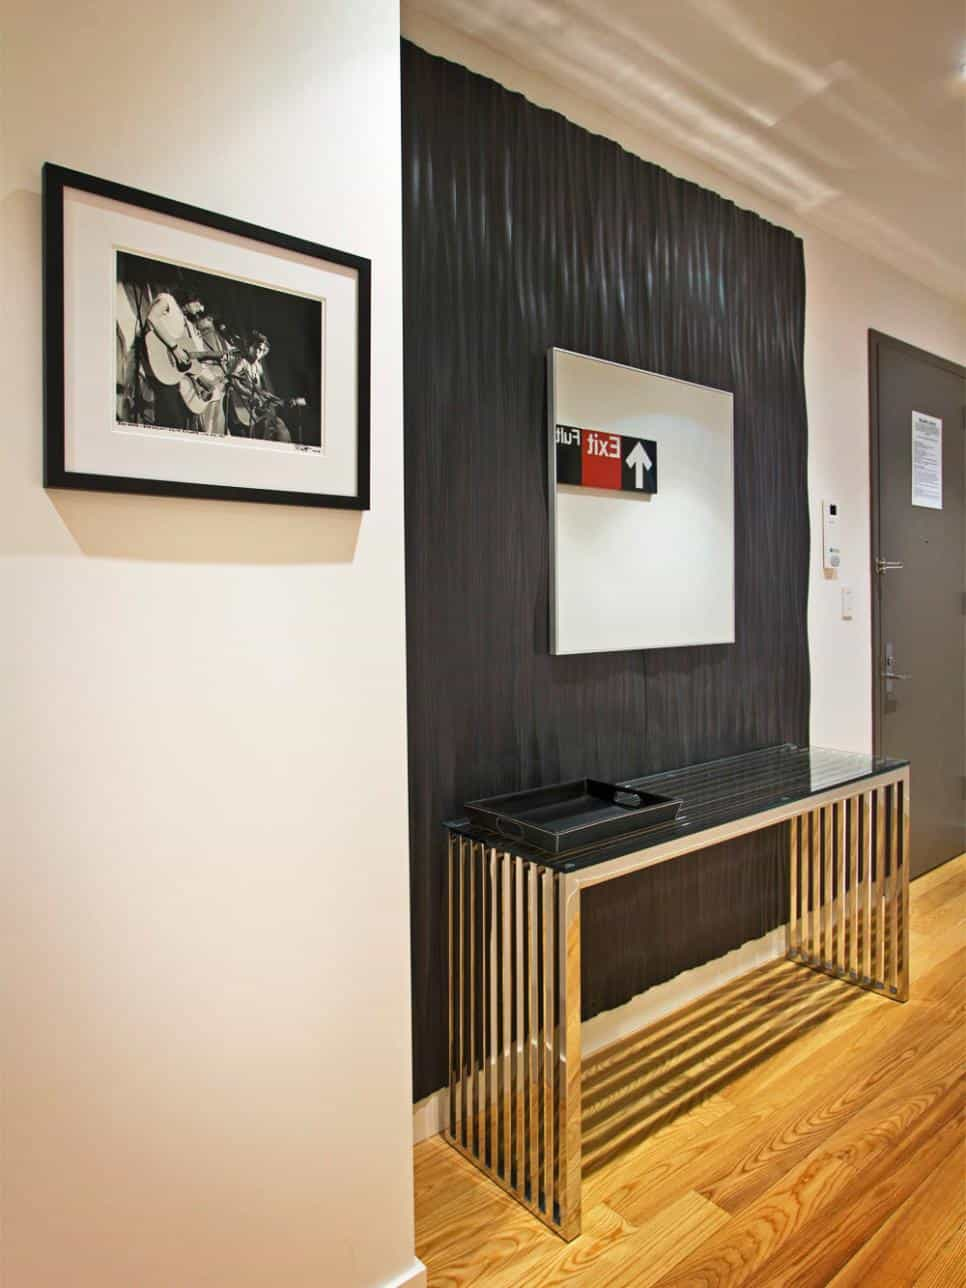 Ebony Accent Wall and Modern Art by Vanessa DeLeon